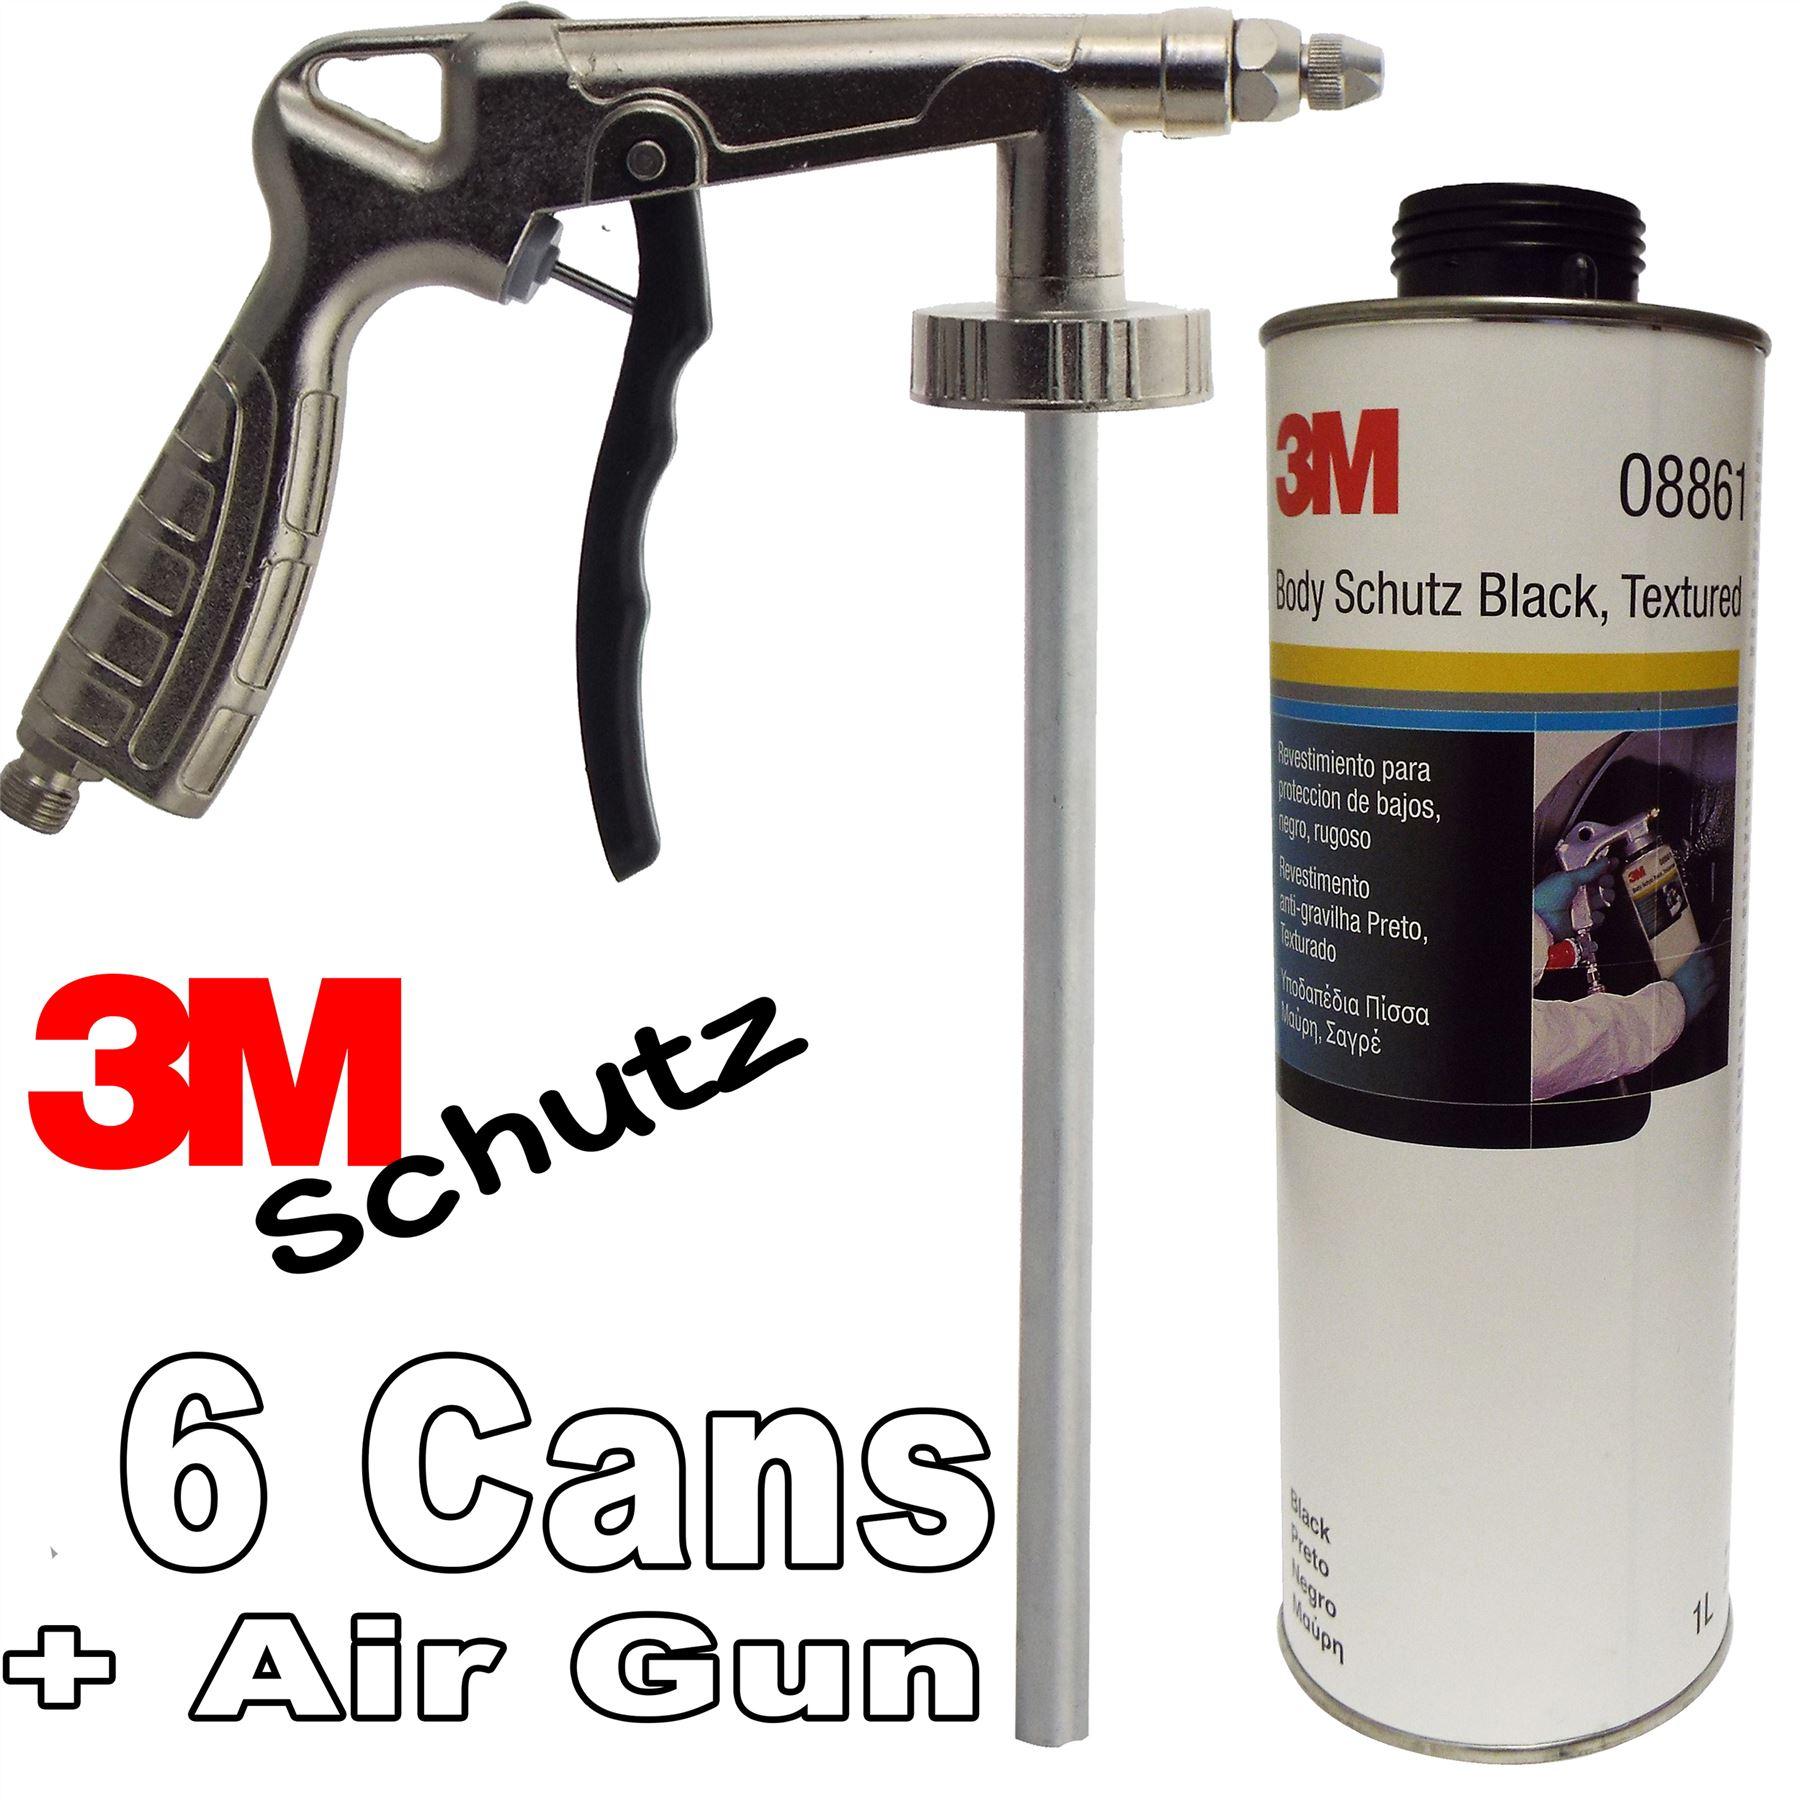 6 X 3M Car Body Schutz   Black Underseal + Underbody Coating Gun 08861